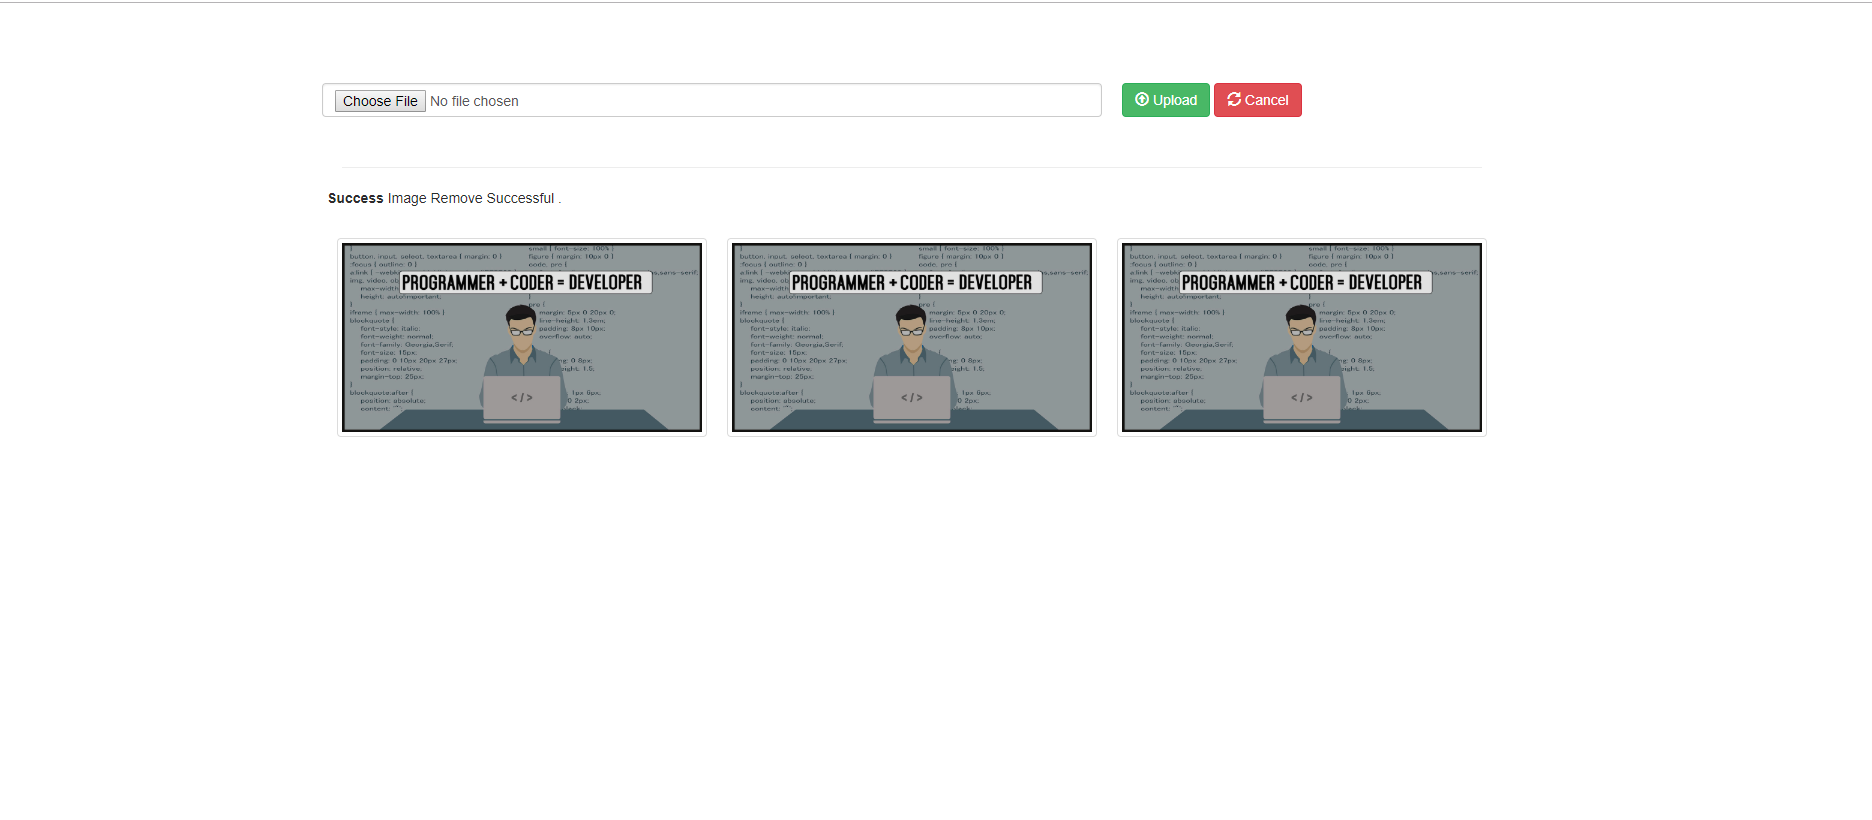 create , Insert ,update,delete Opearation